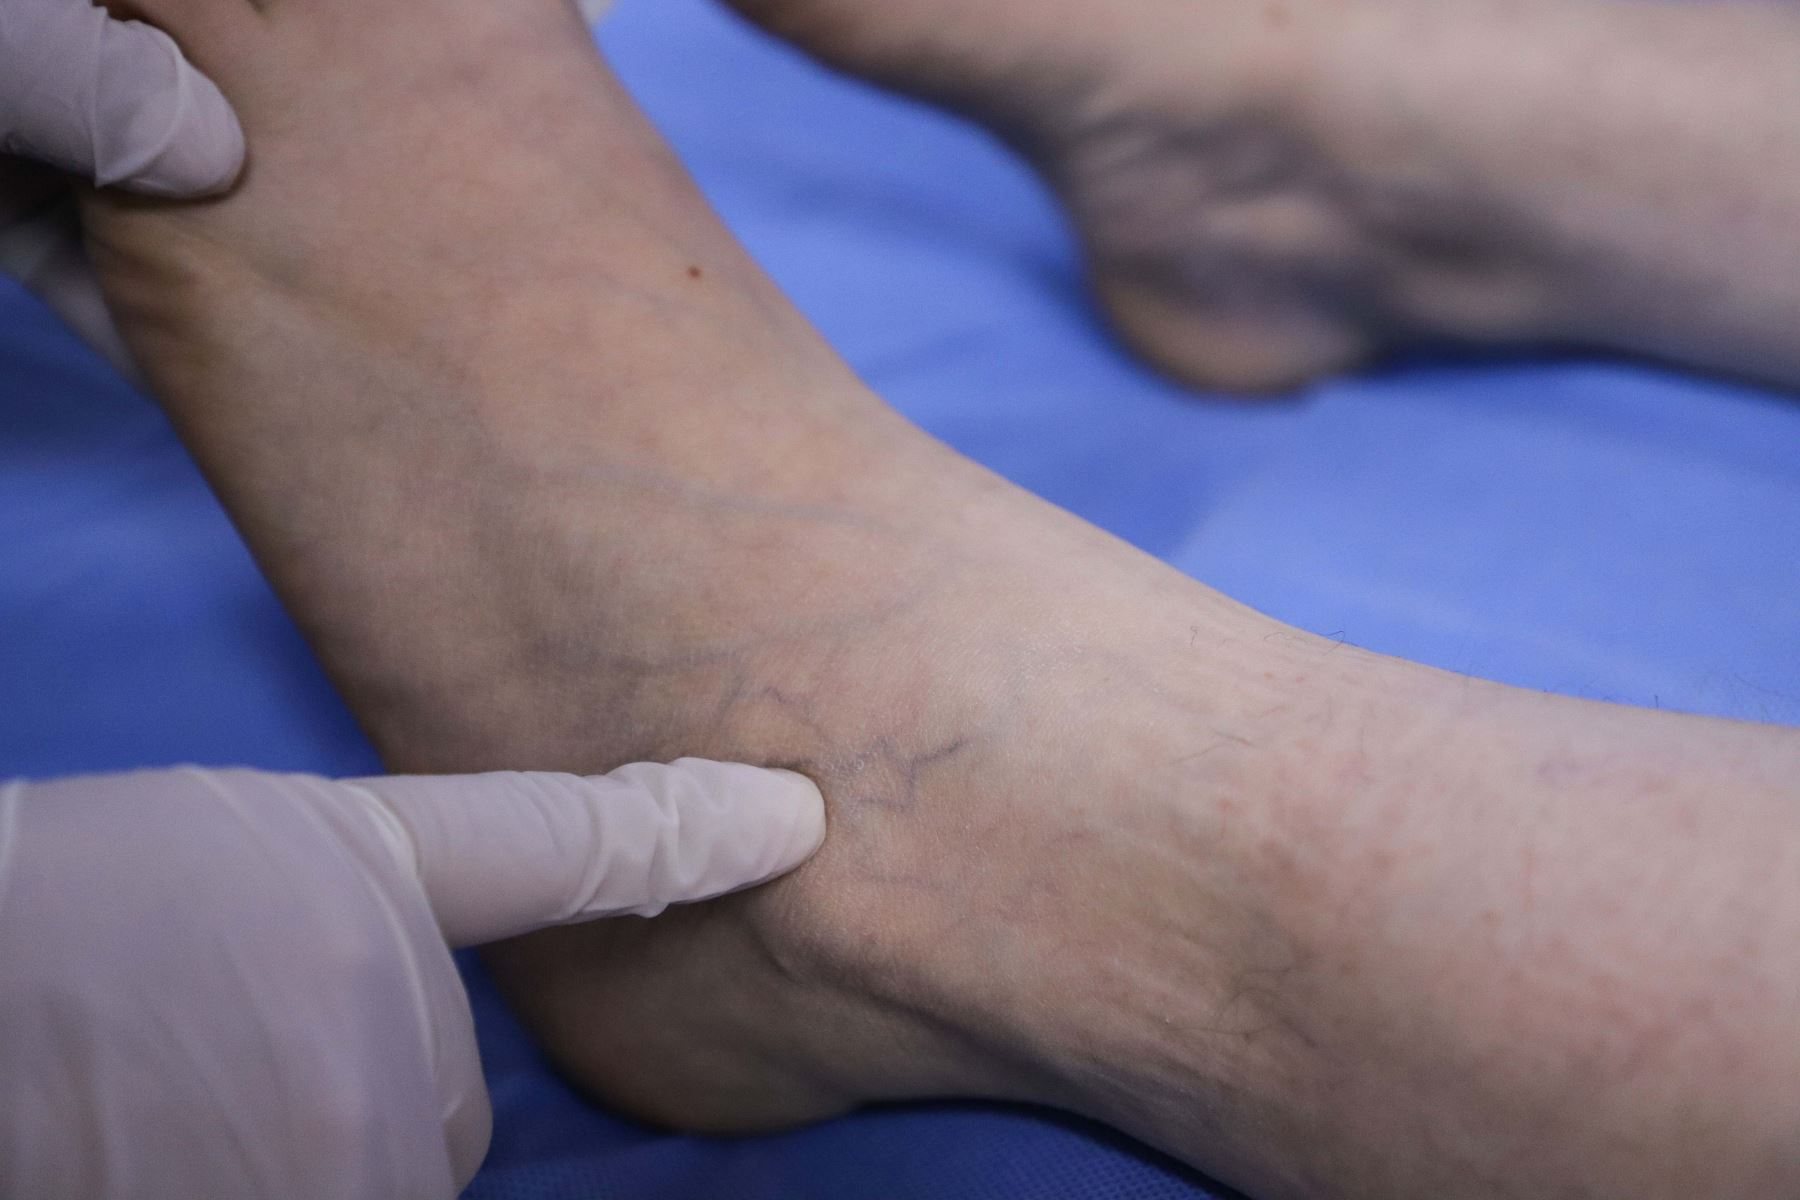 Hospital Edgardo Rebagliati reporta 60 mil casos asociados a trombosis en los últimos seis meses. Foto: ANDINA/Difusión.